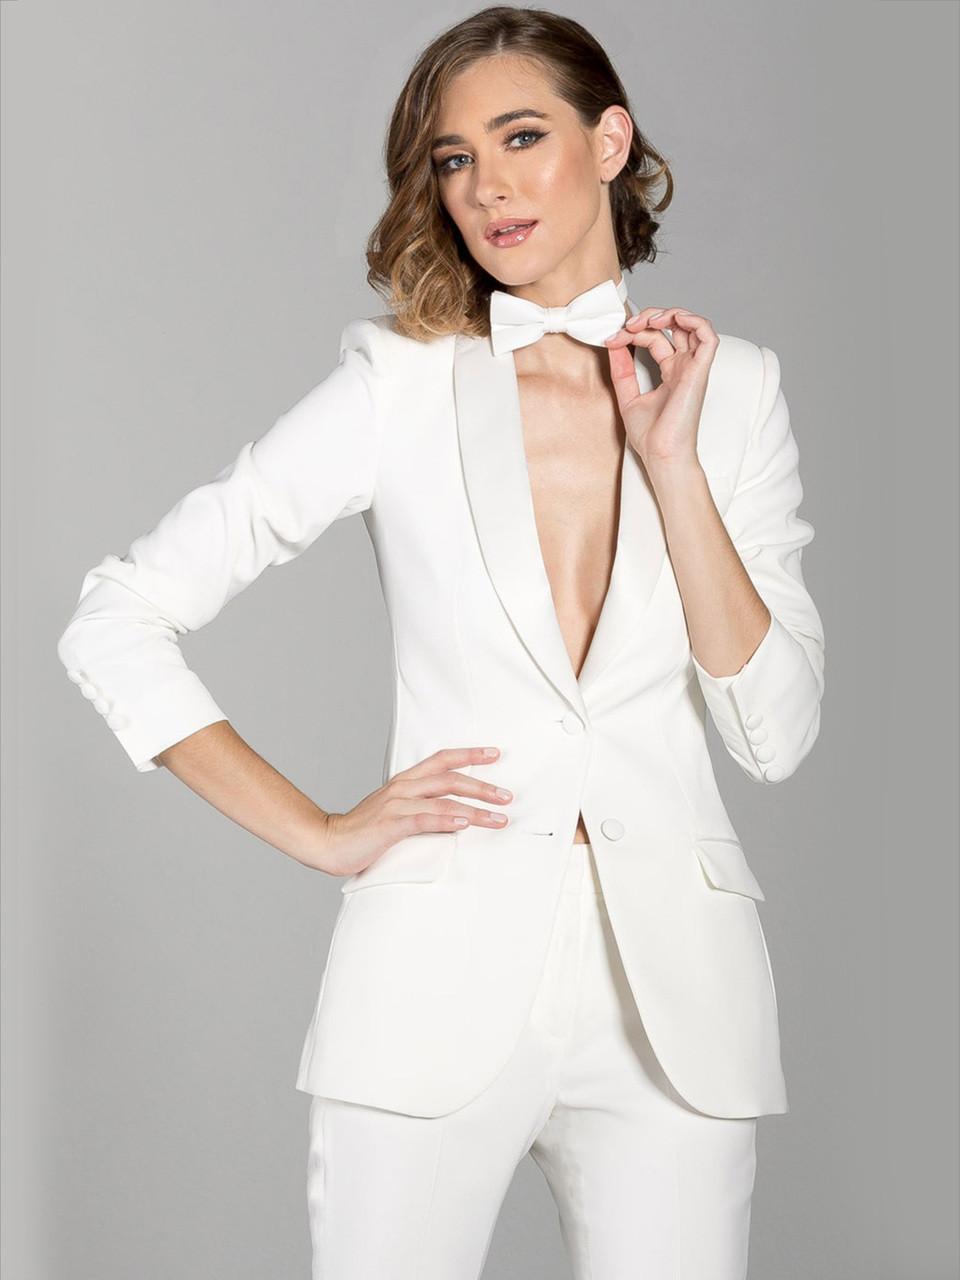 Women Tuxedo Jacket Marilyn Promheadquarters Com